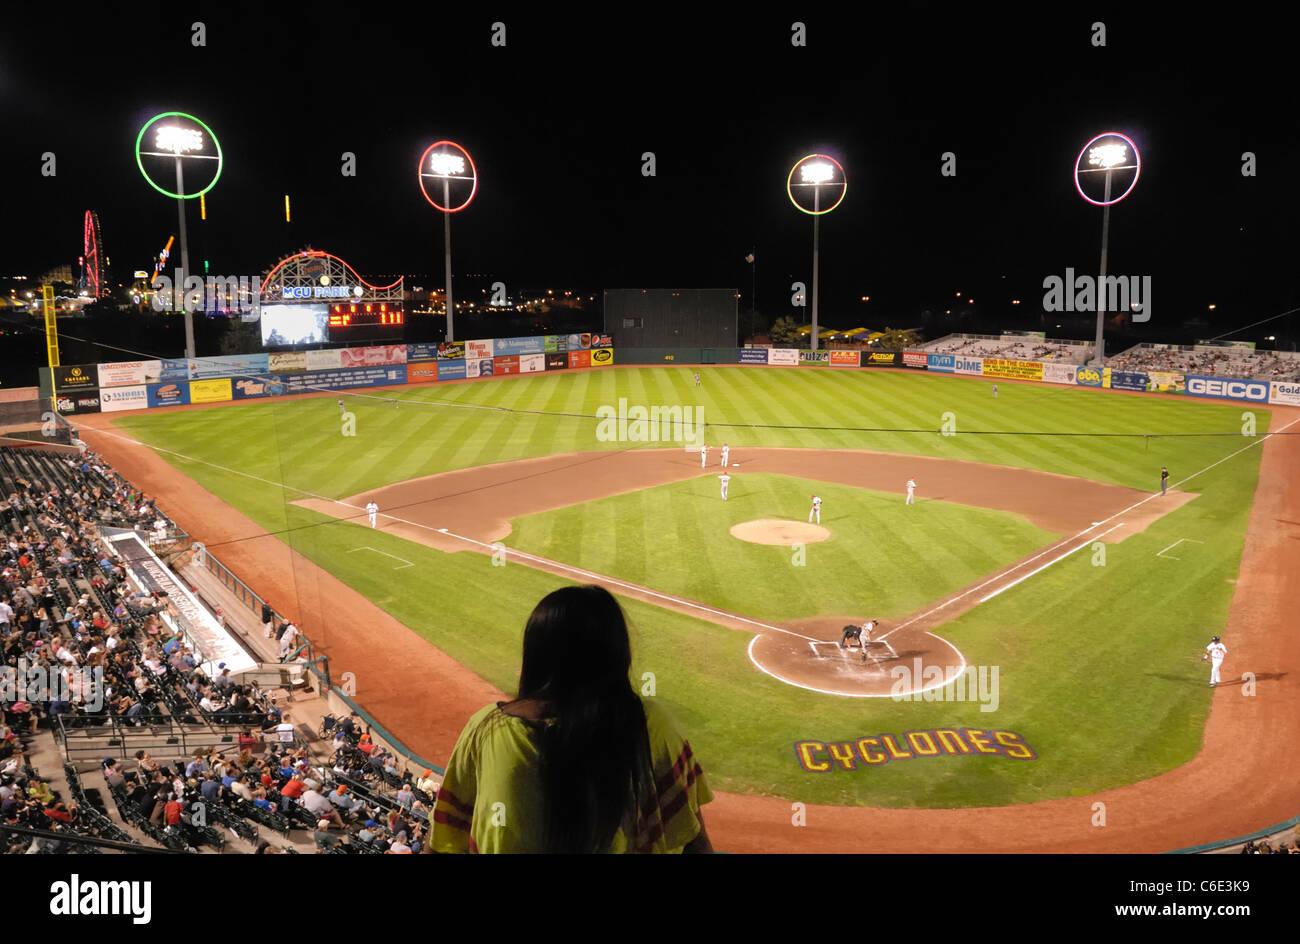 Brooklyn Cyclones Night Baseball Game, View From Luxury